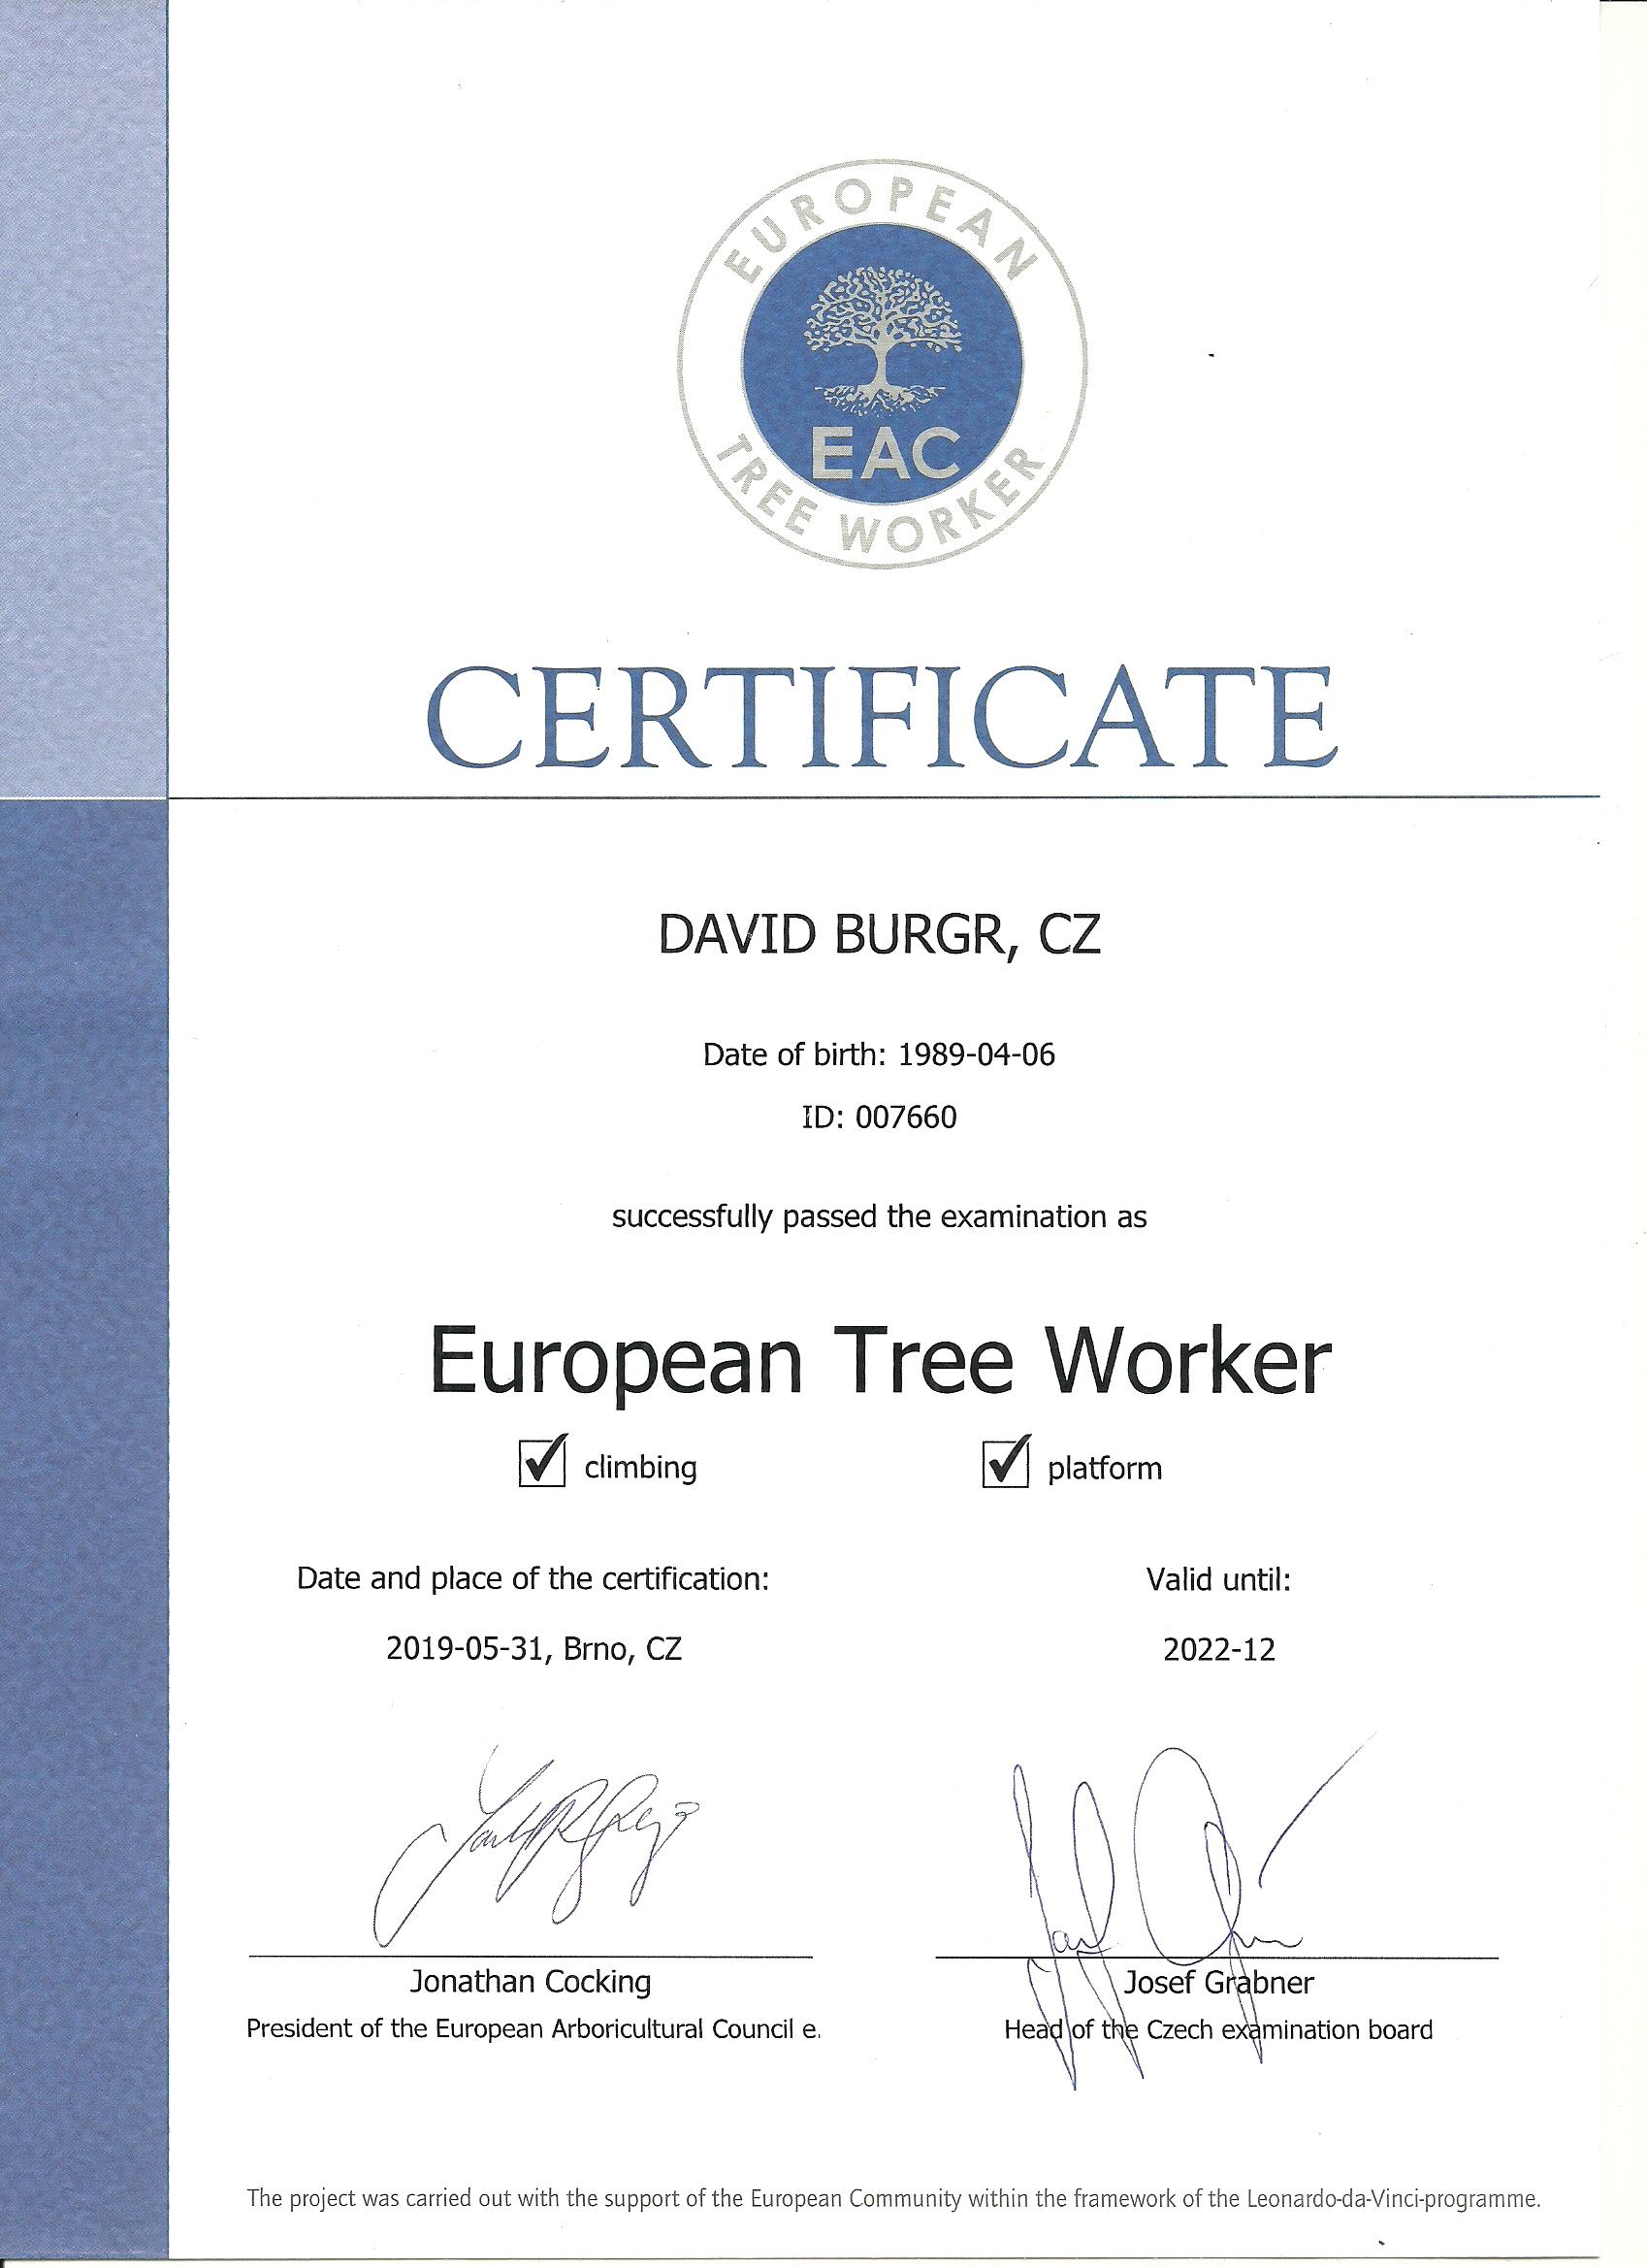 europeanTreeWorker